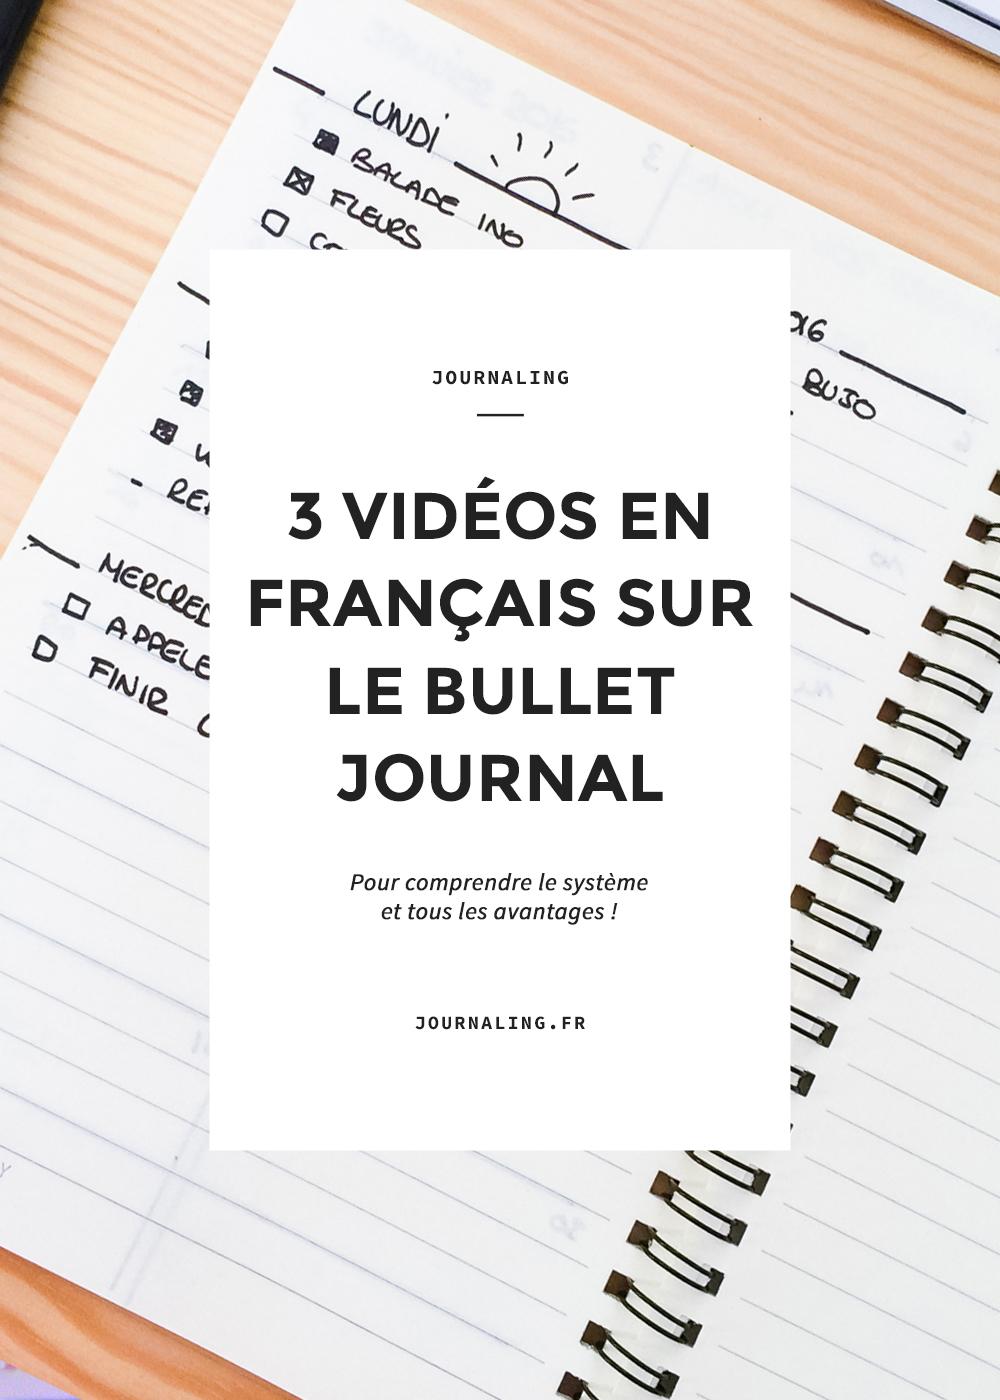 video-bullet-journal-francais